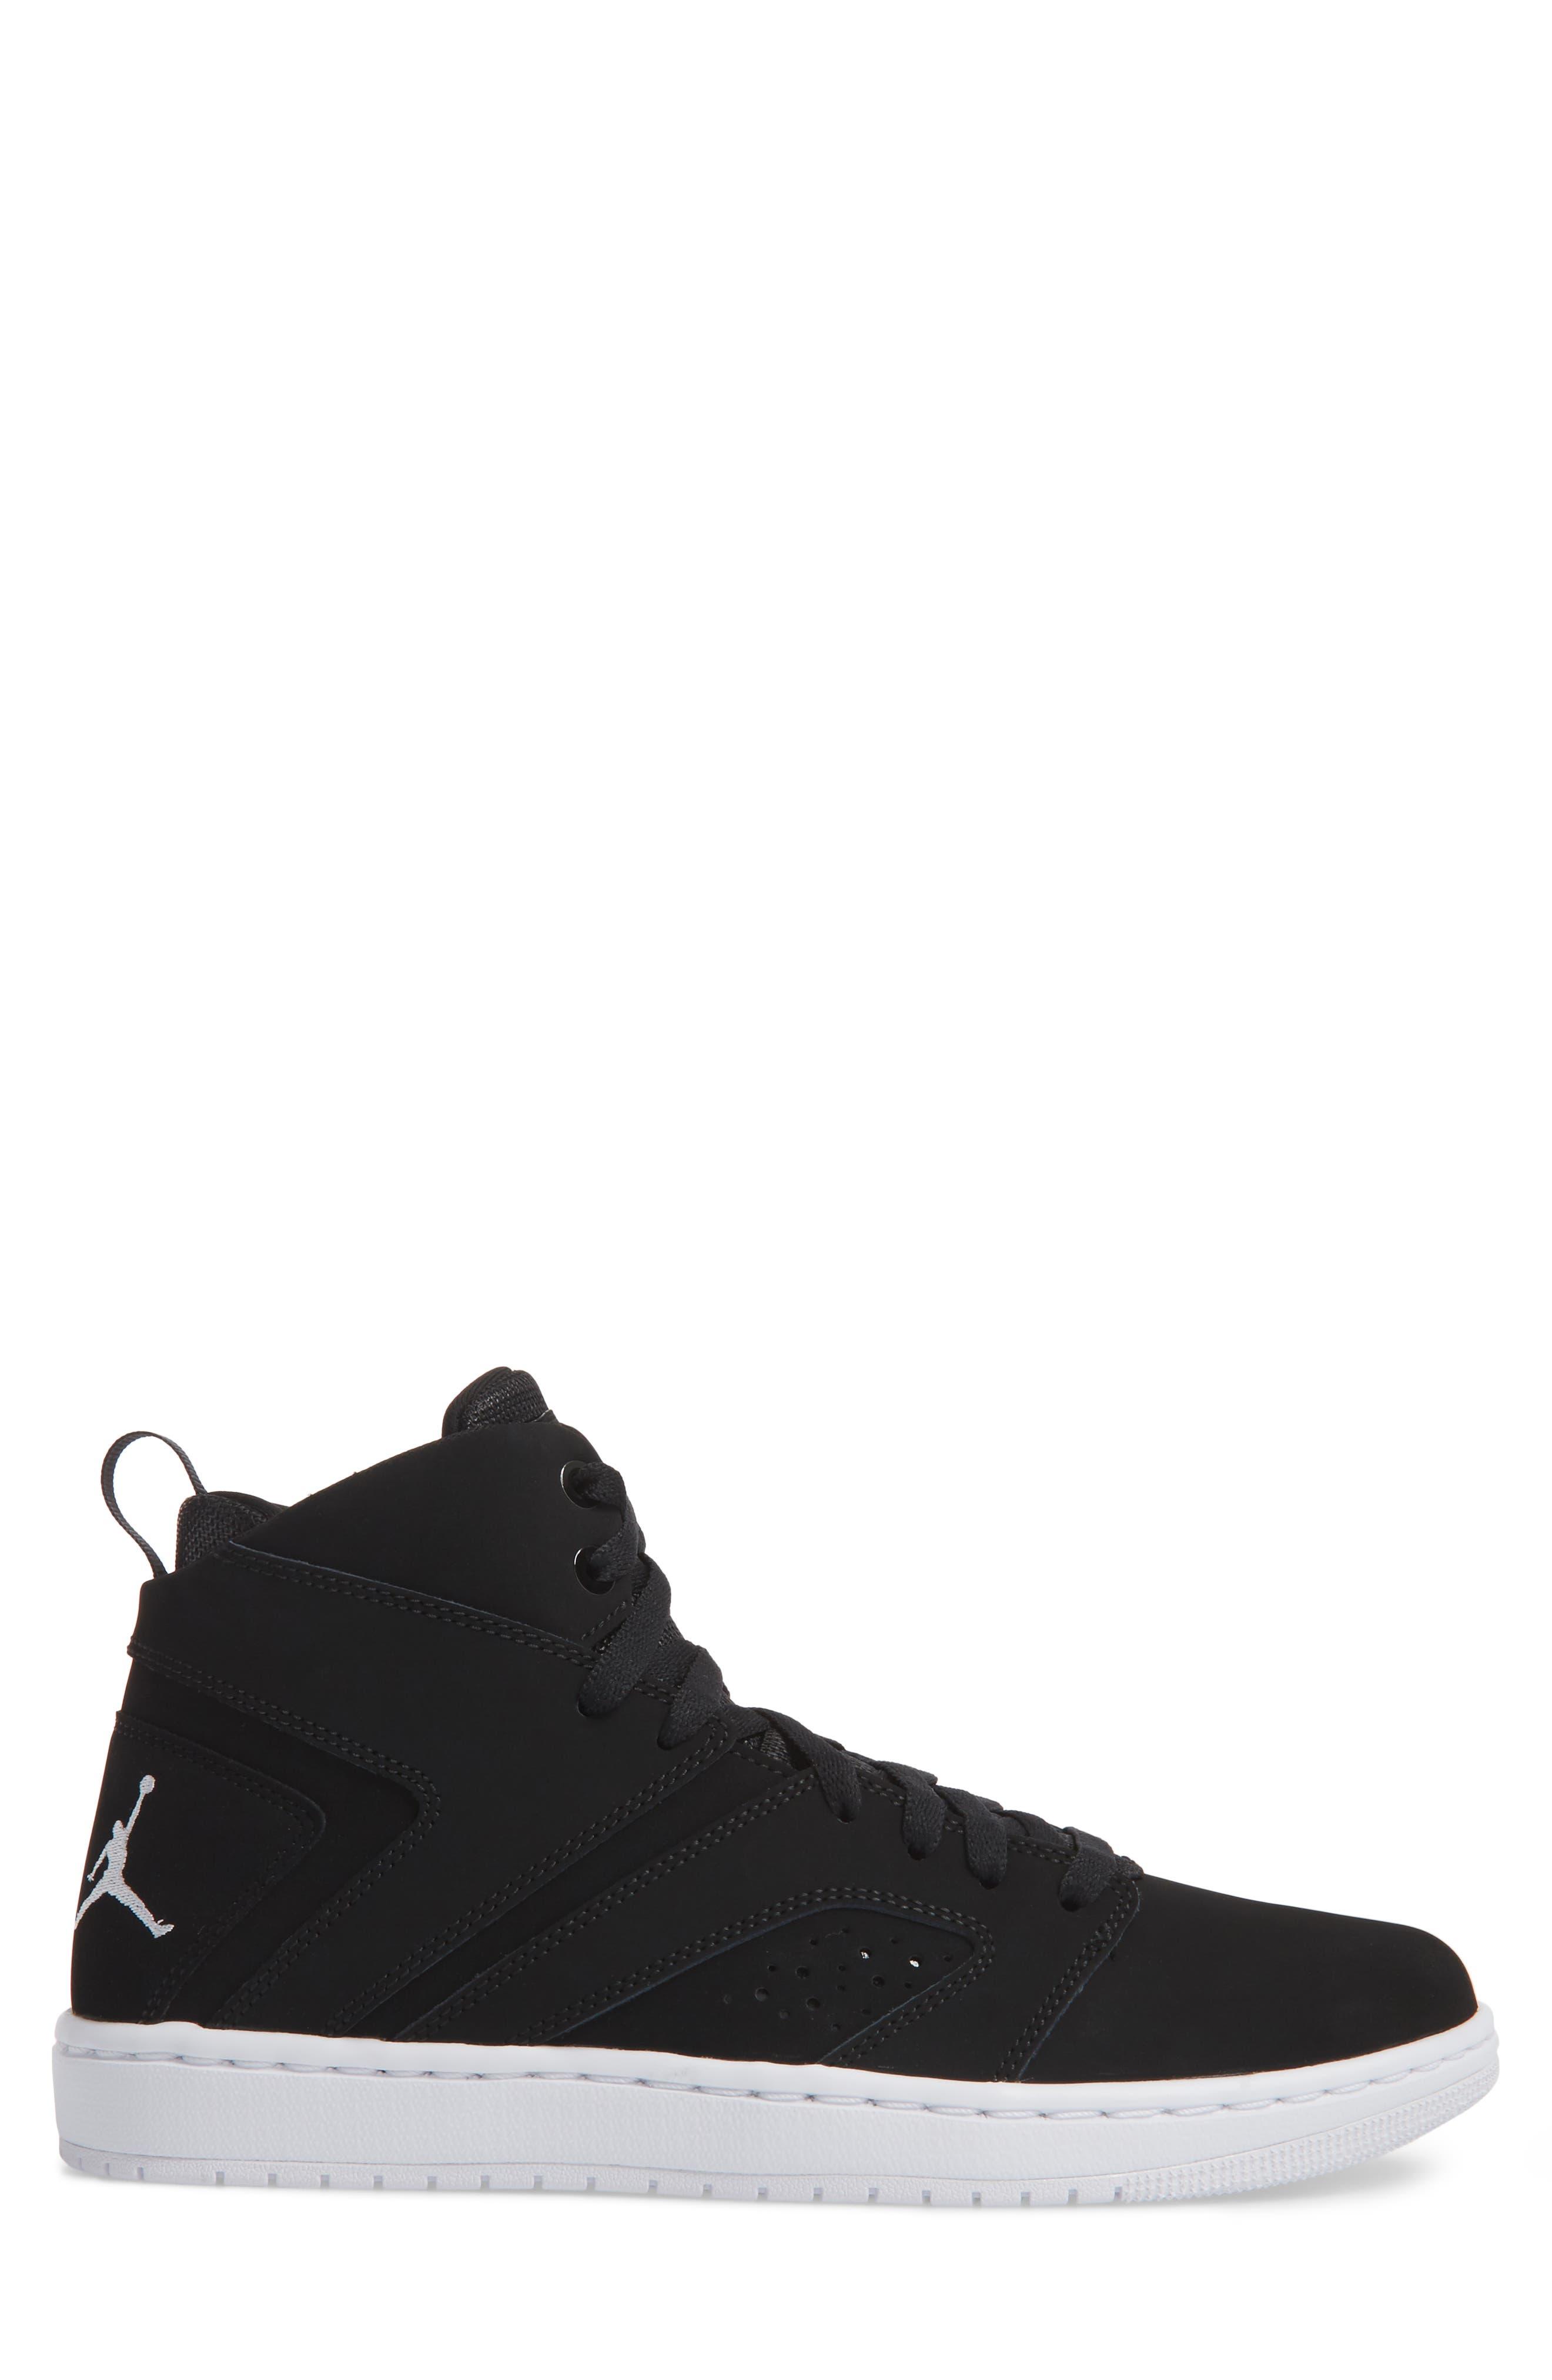 Air Jordan Flight Next Sneaker,                             Alternate thumbnail 3, color,                             010